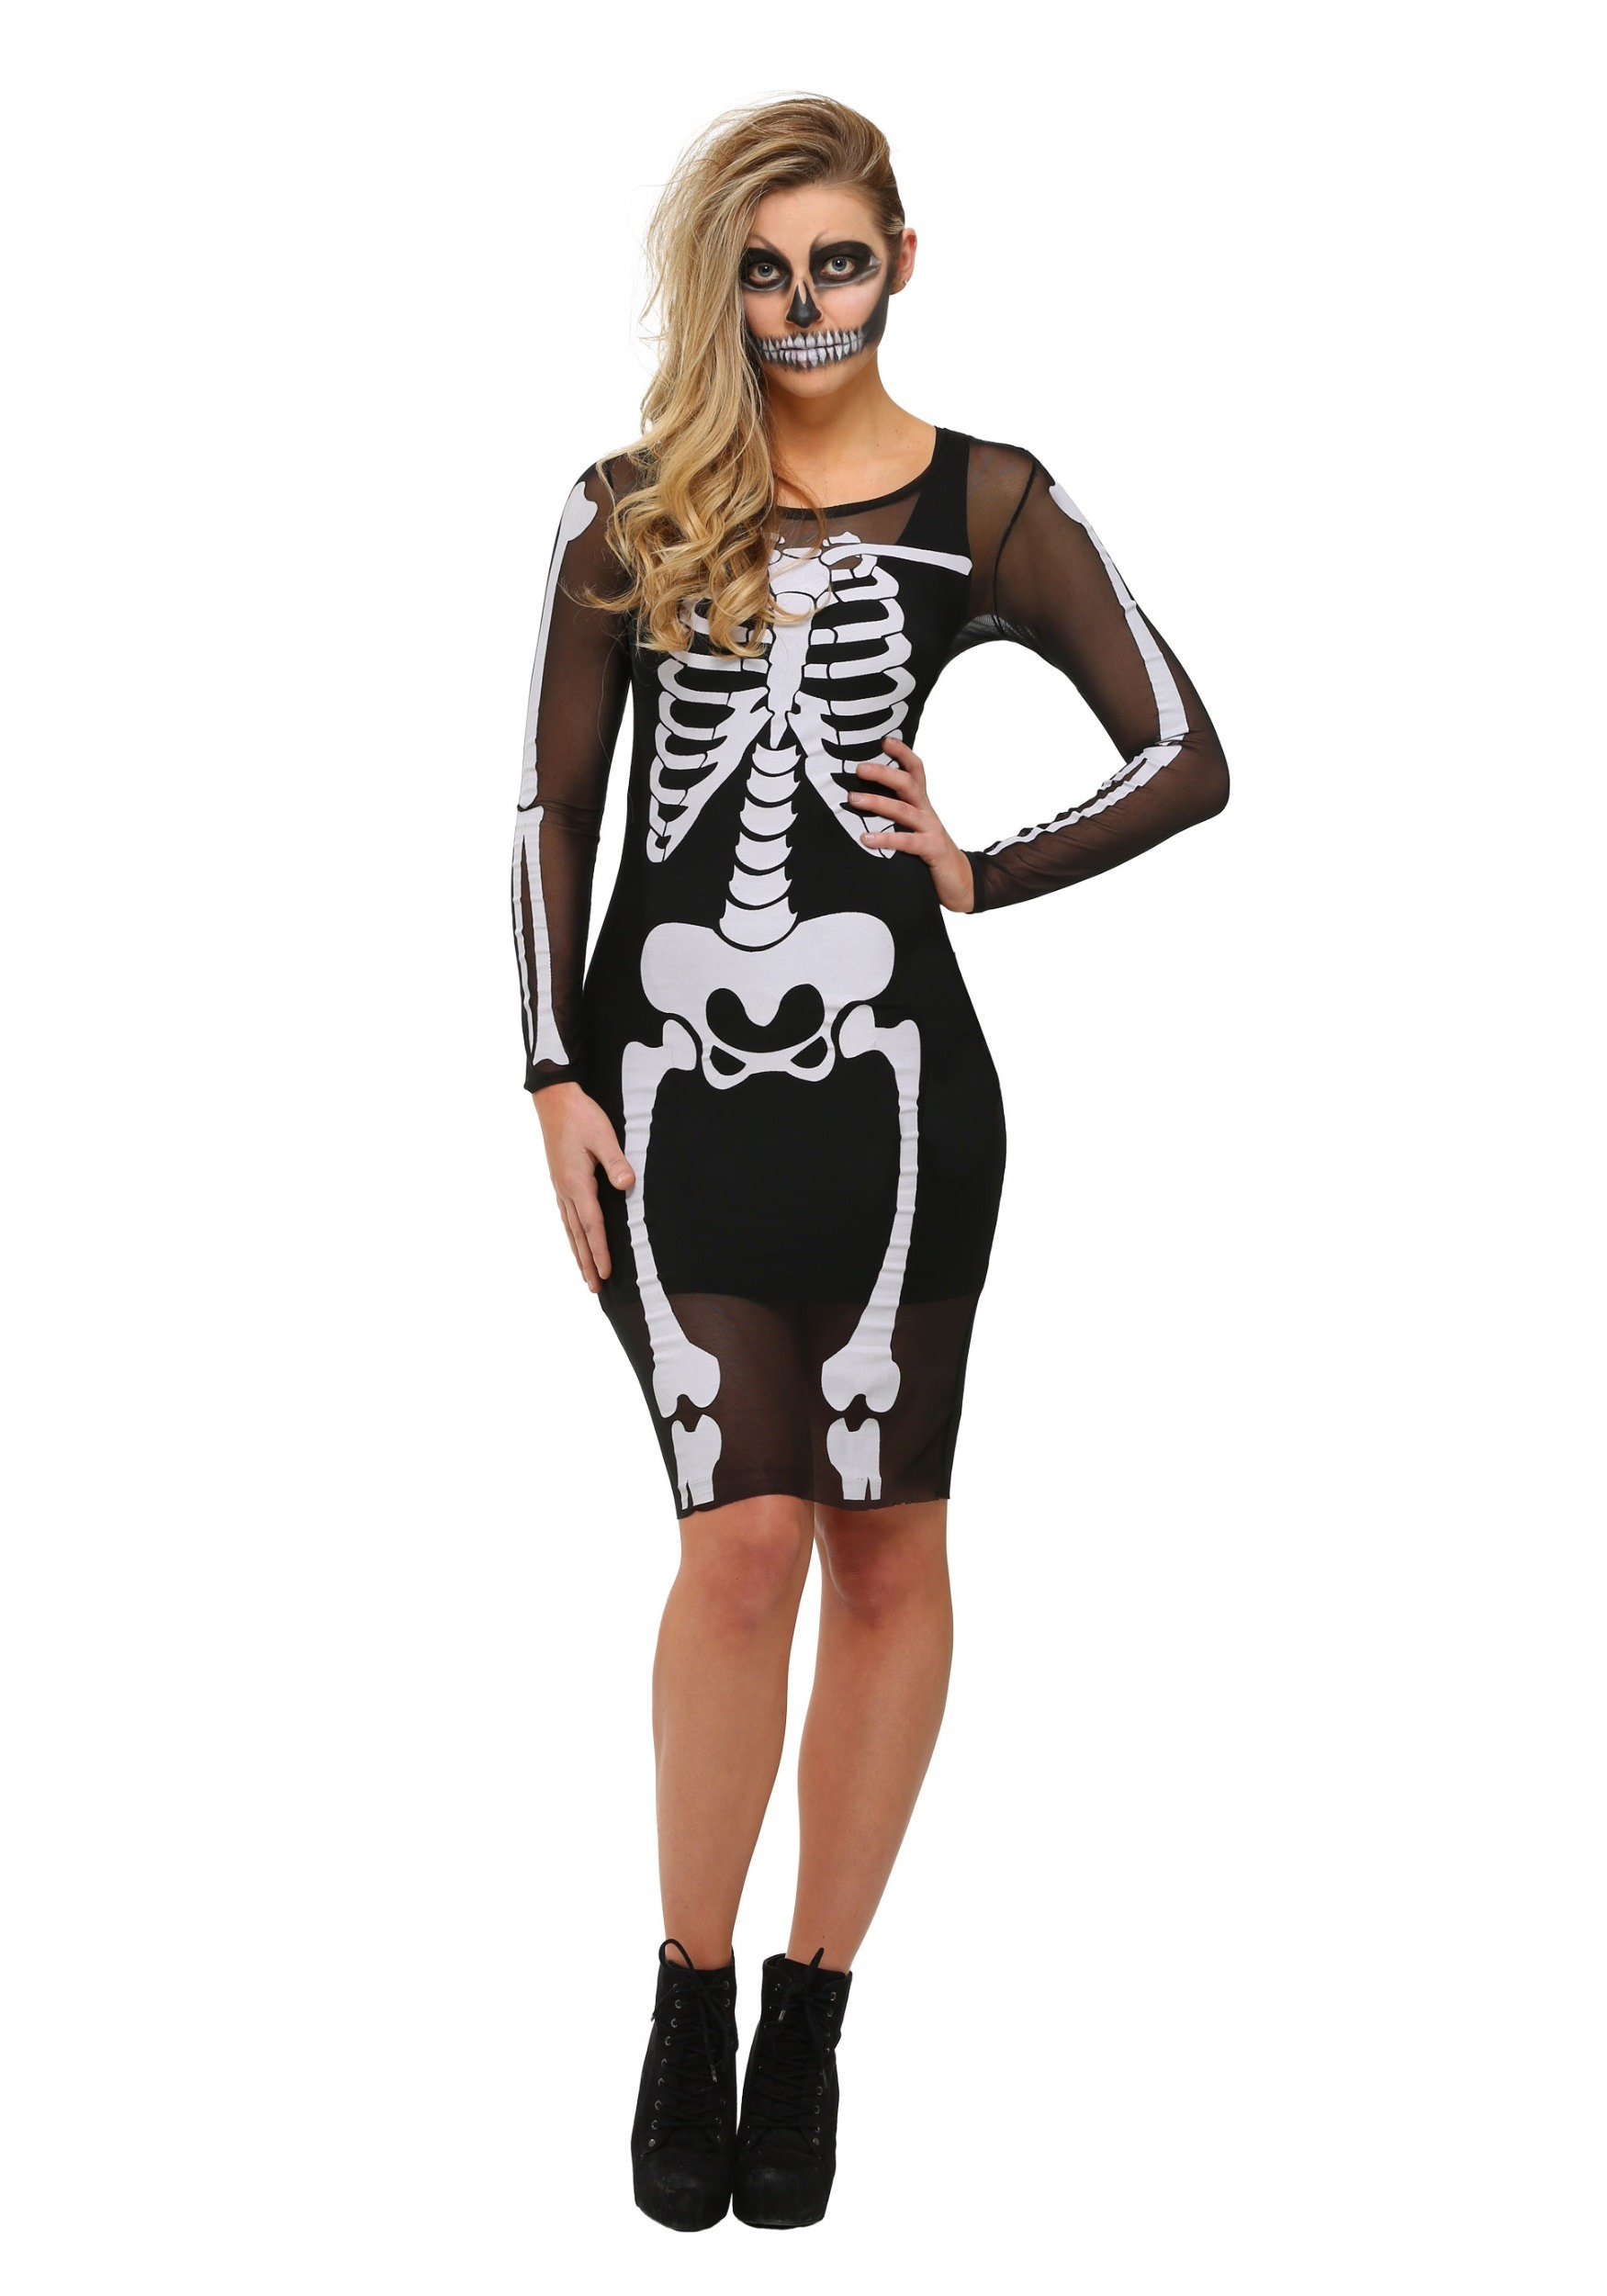 Skeleton Costumes - Adult, Girls Skeleton Costume